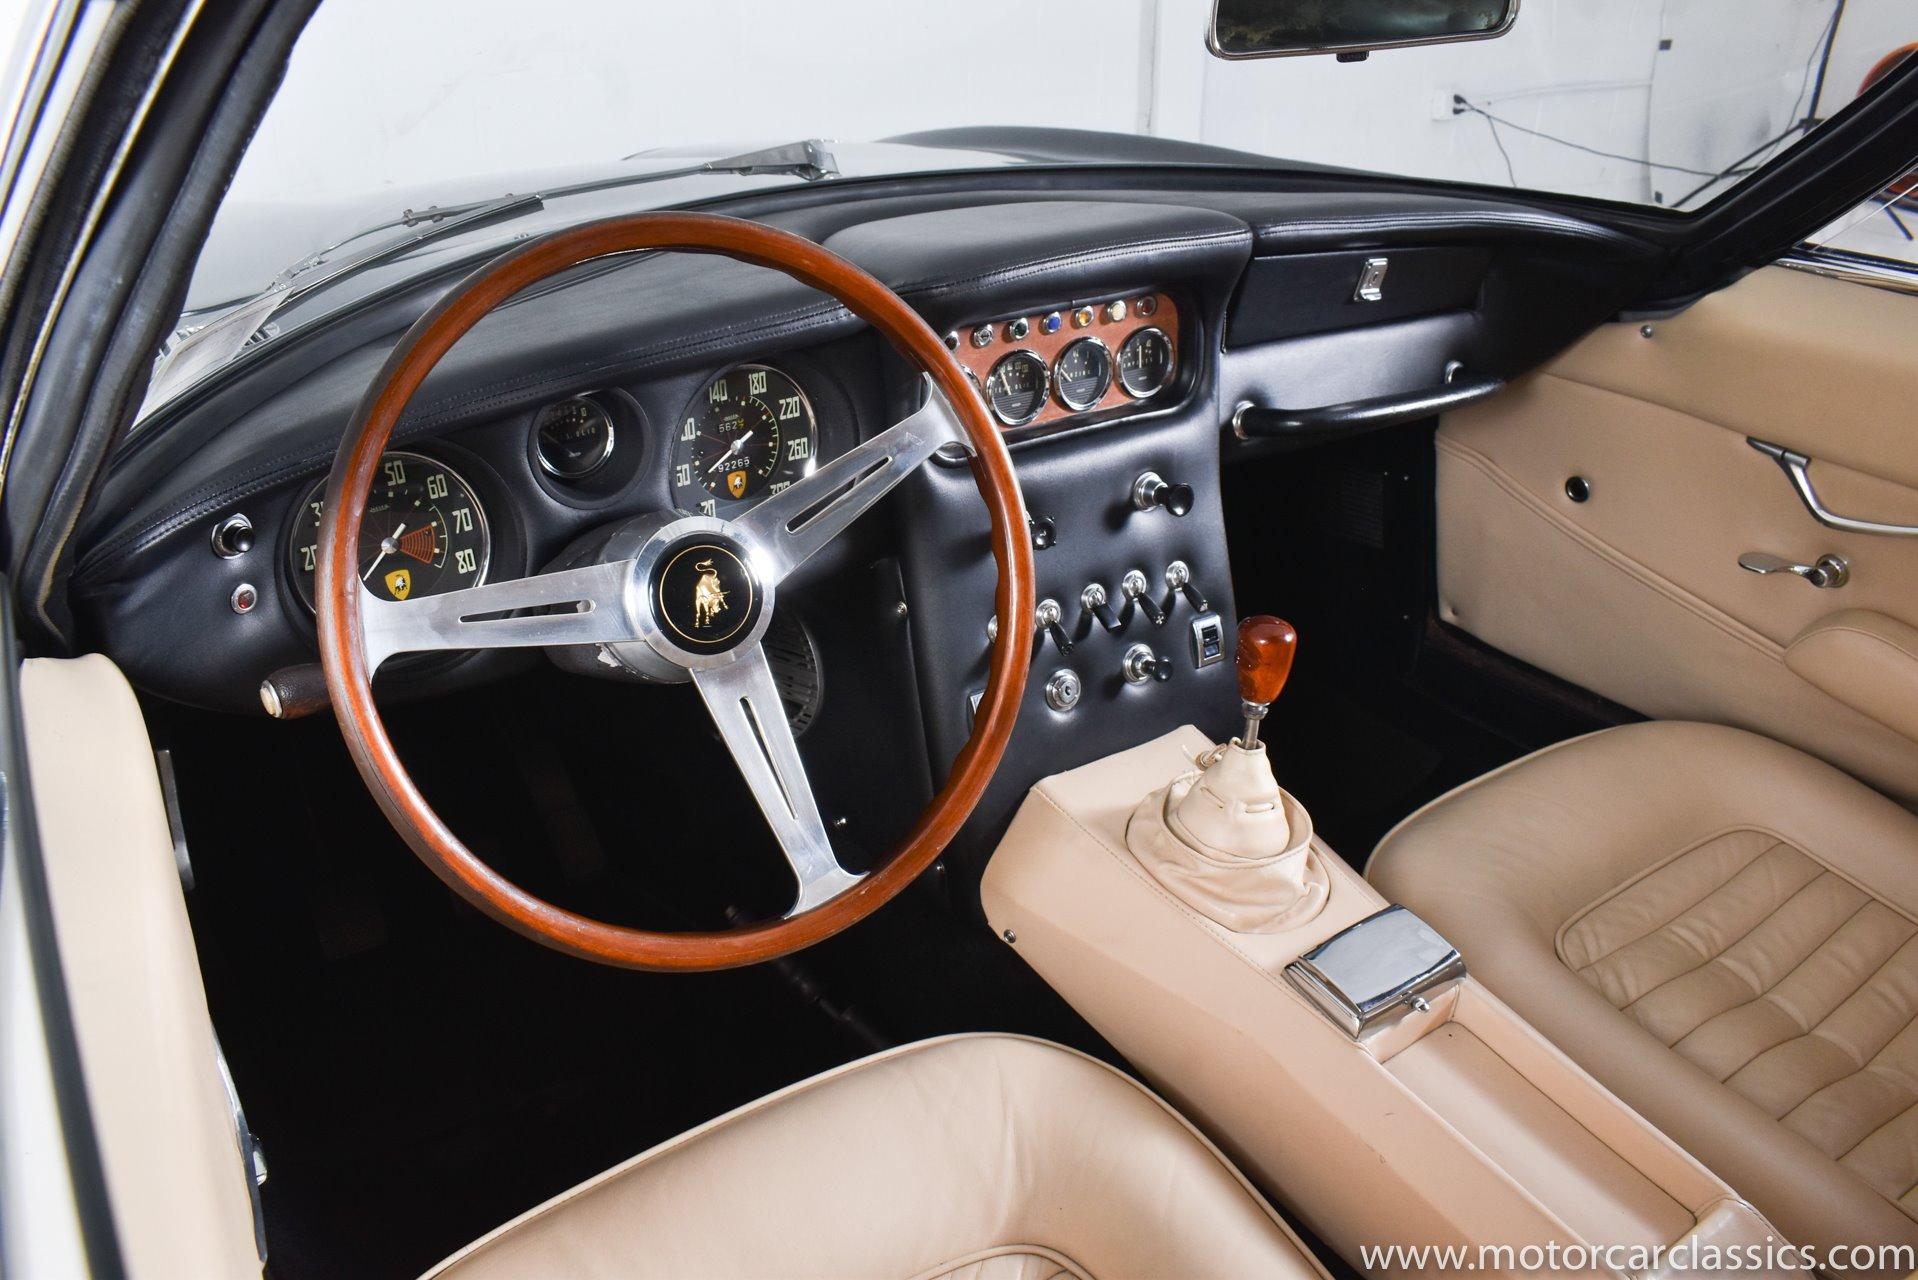 1967 Lamborghini 400GT Coupe 2+2 RWD